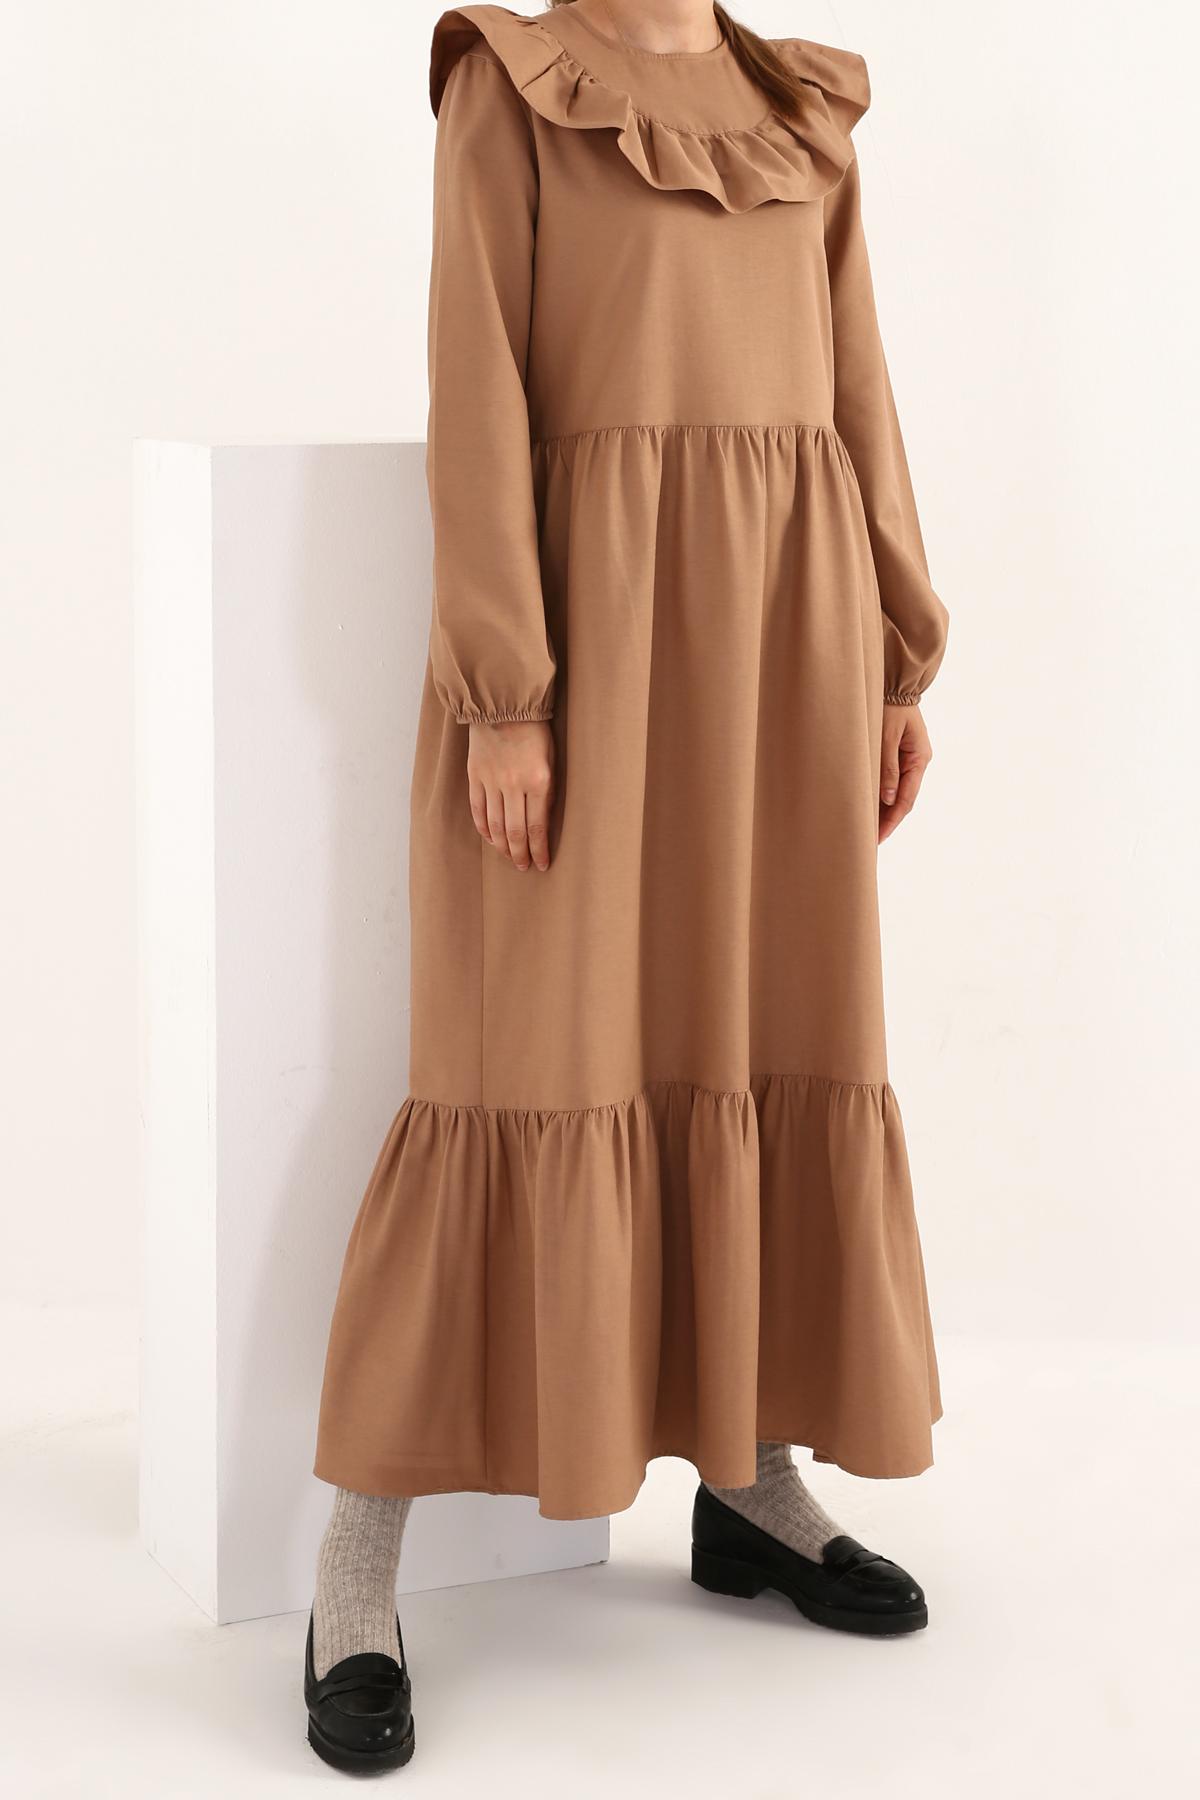 Ruffle Neck Maxi Cotton Dress